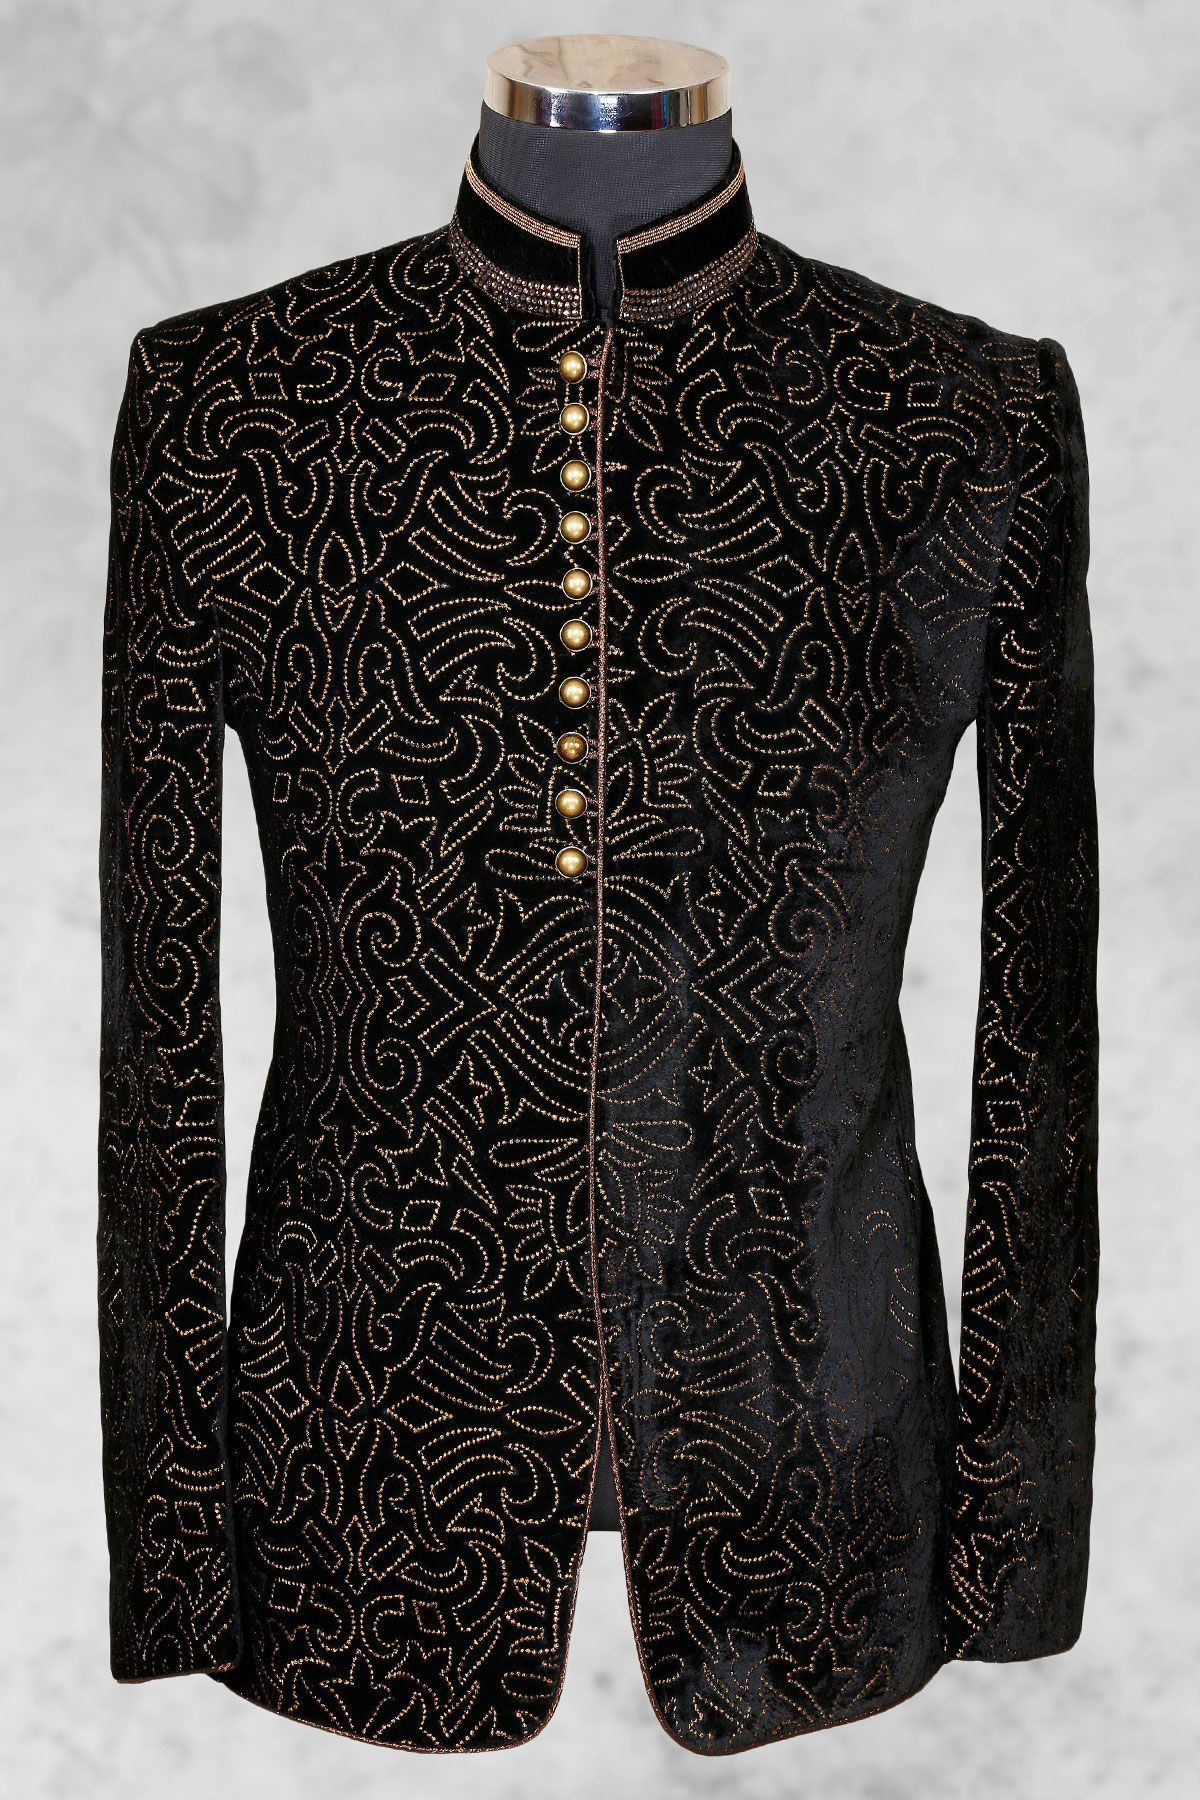 Buy Black Velvet Bead Embroidered Jodhpuri Suit Online 644cf4d573c